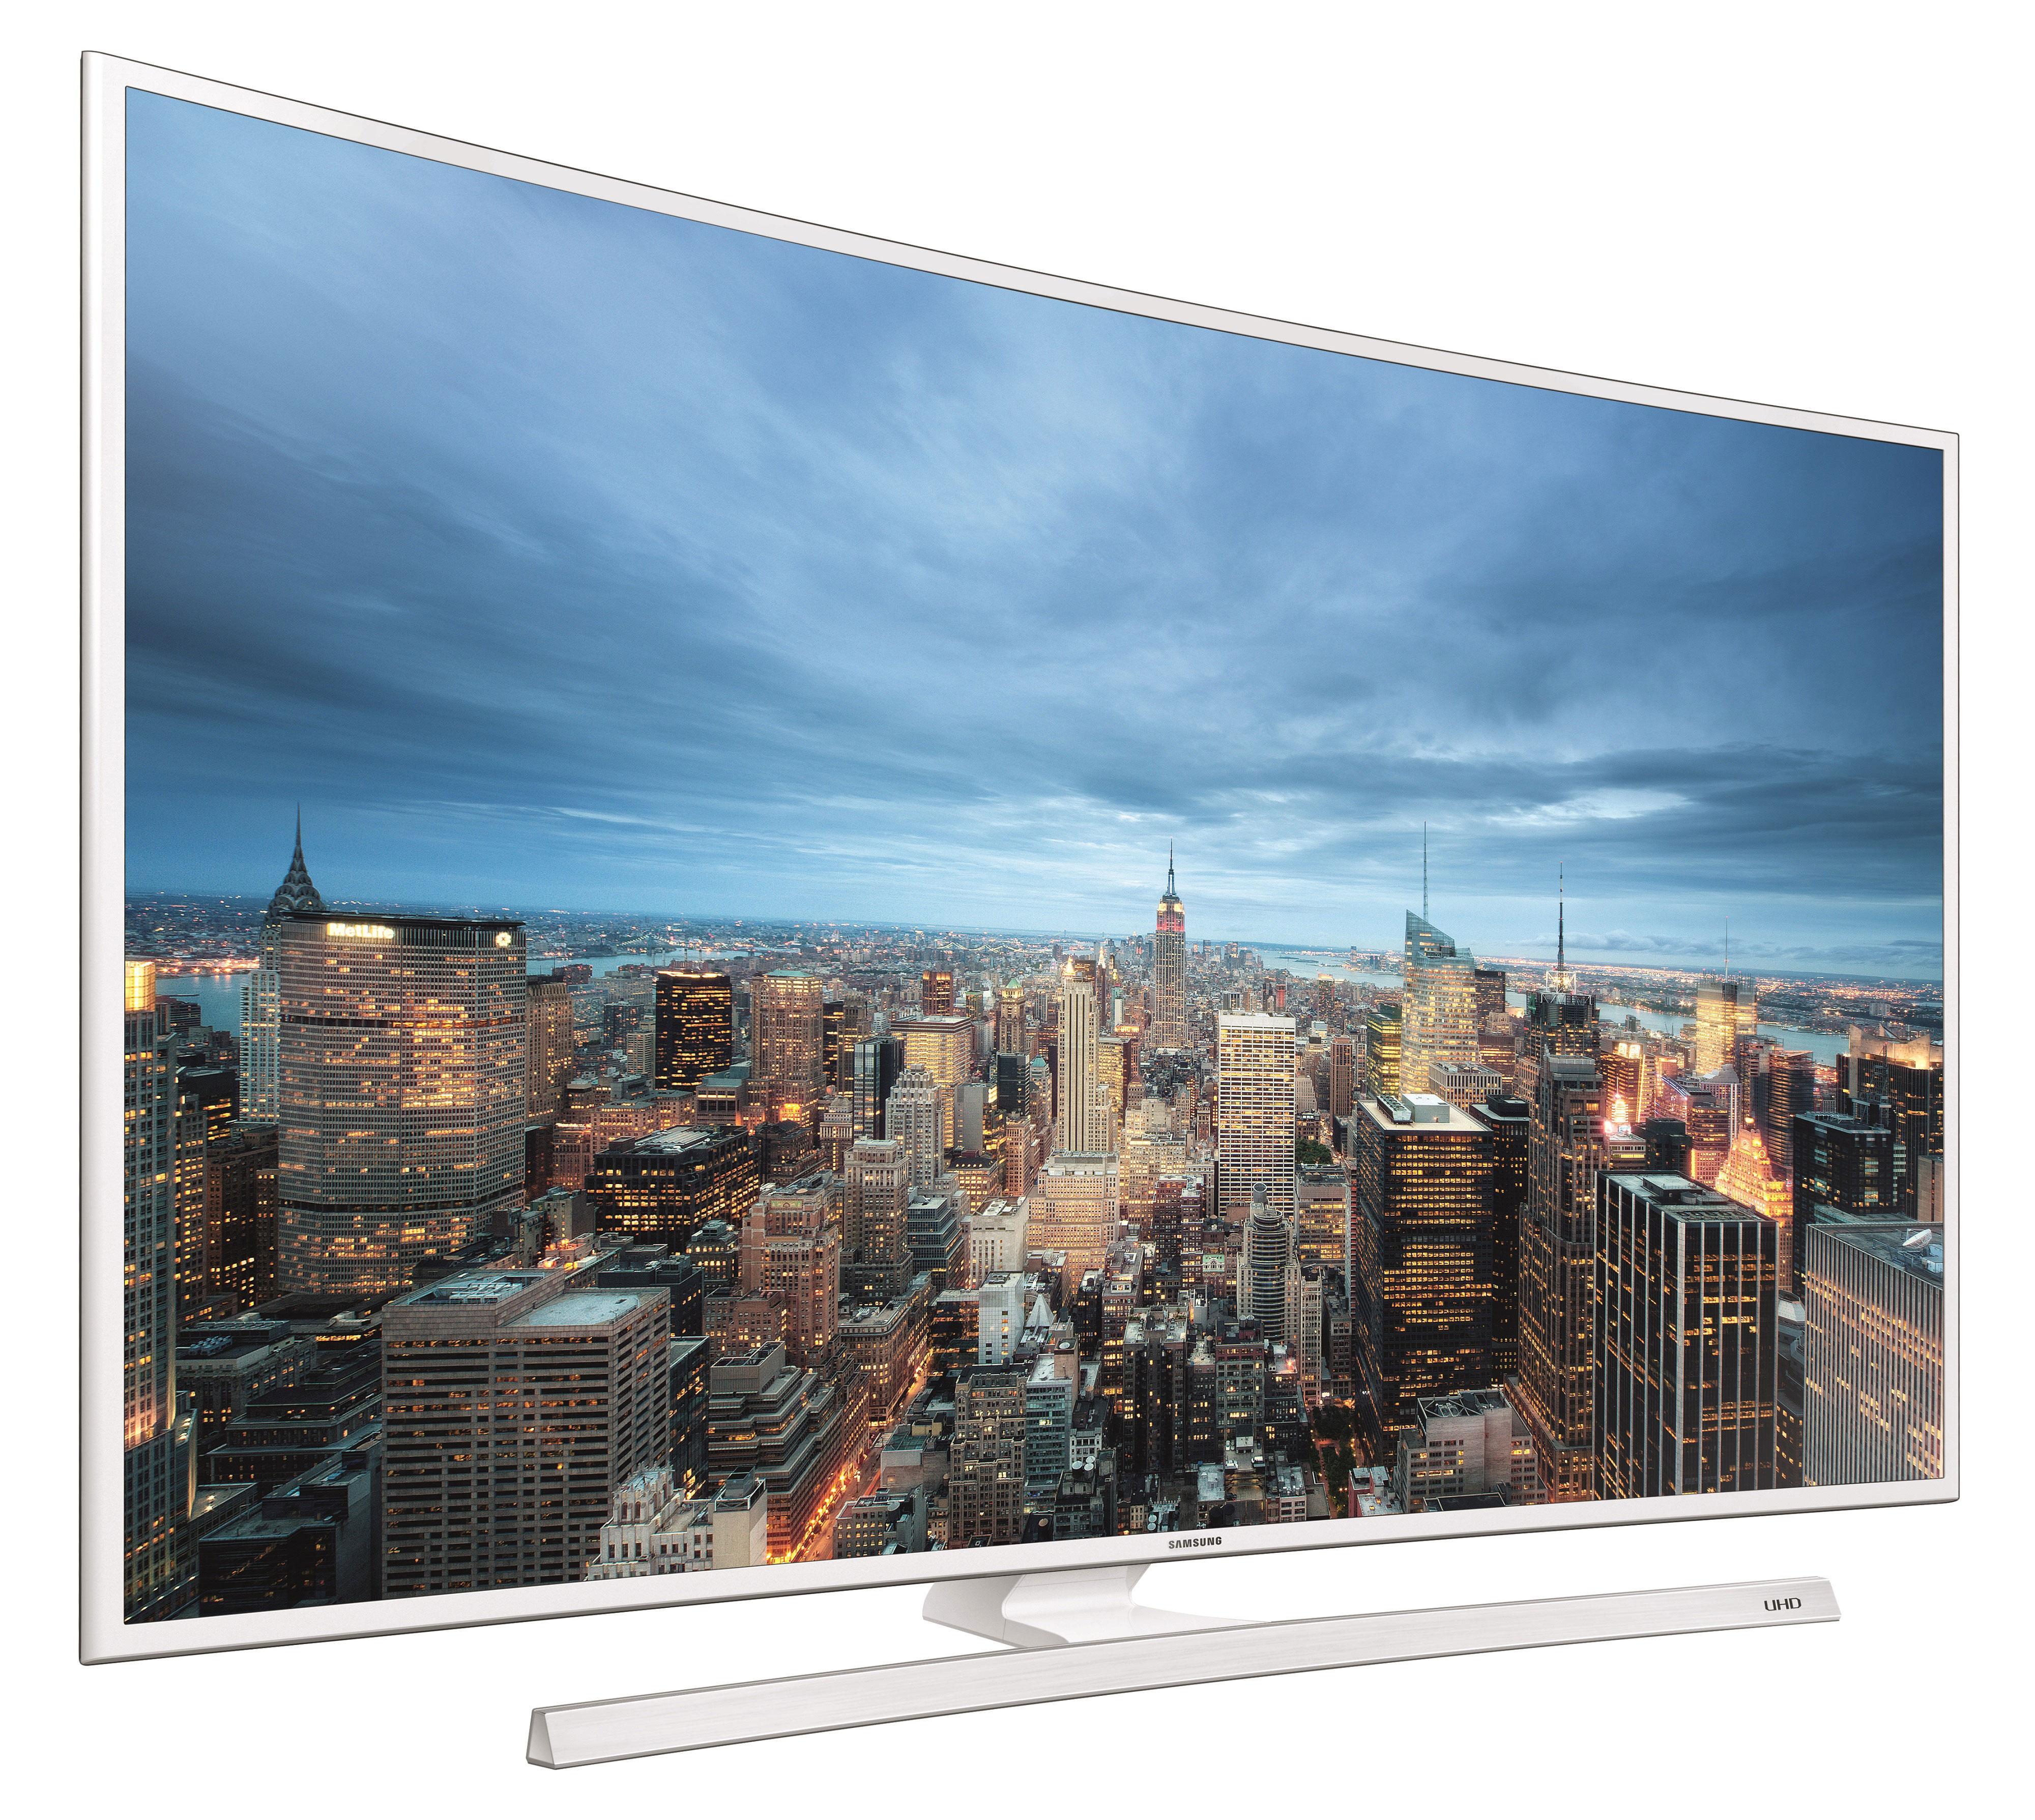 samsung ju6580 121 cm 48 zoll curved fernseher ultra hd triple tuner smart tv. Black Bedroom Furniture Sets. Home Design Ideas